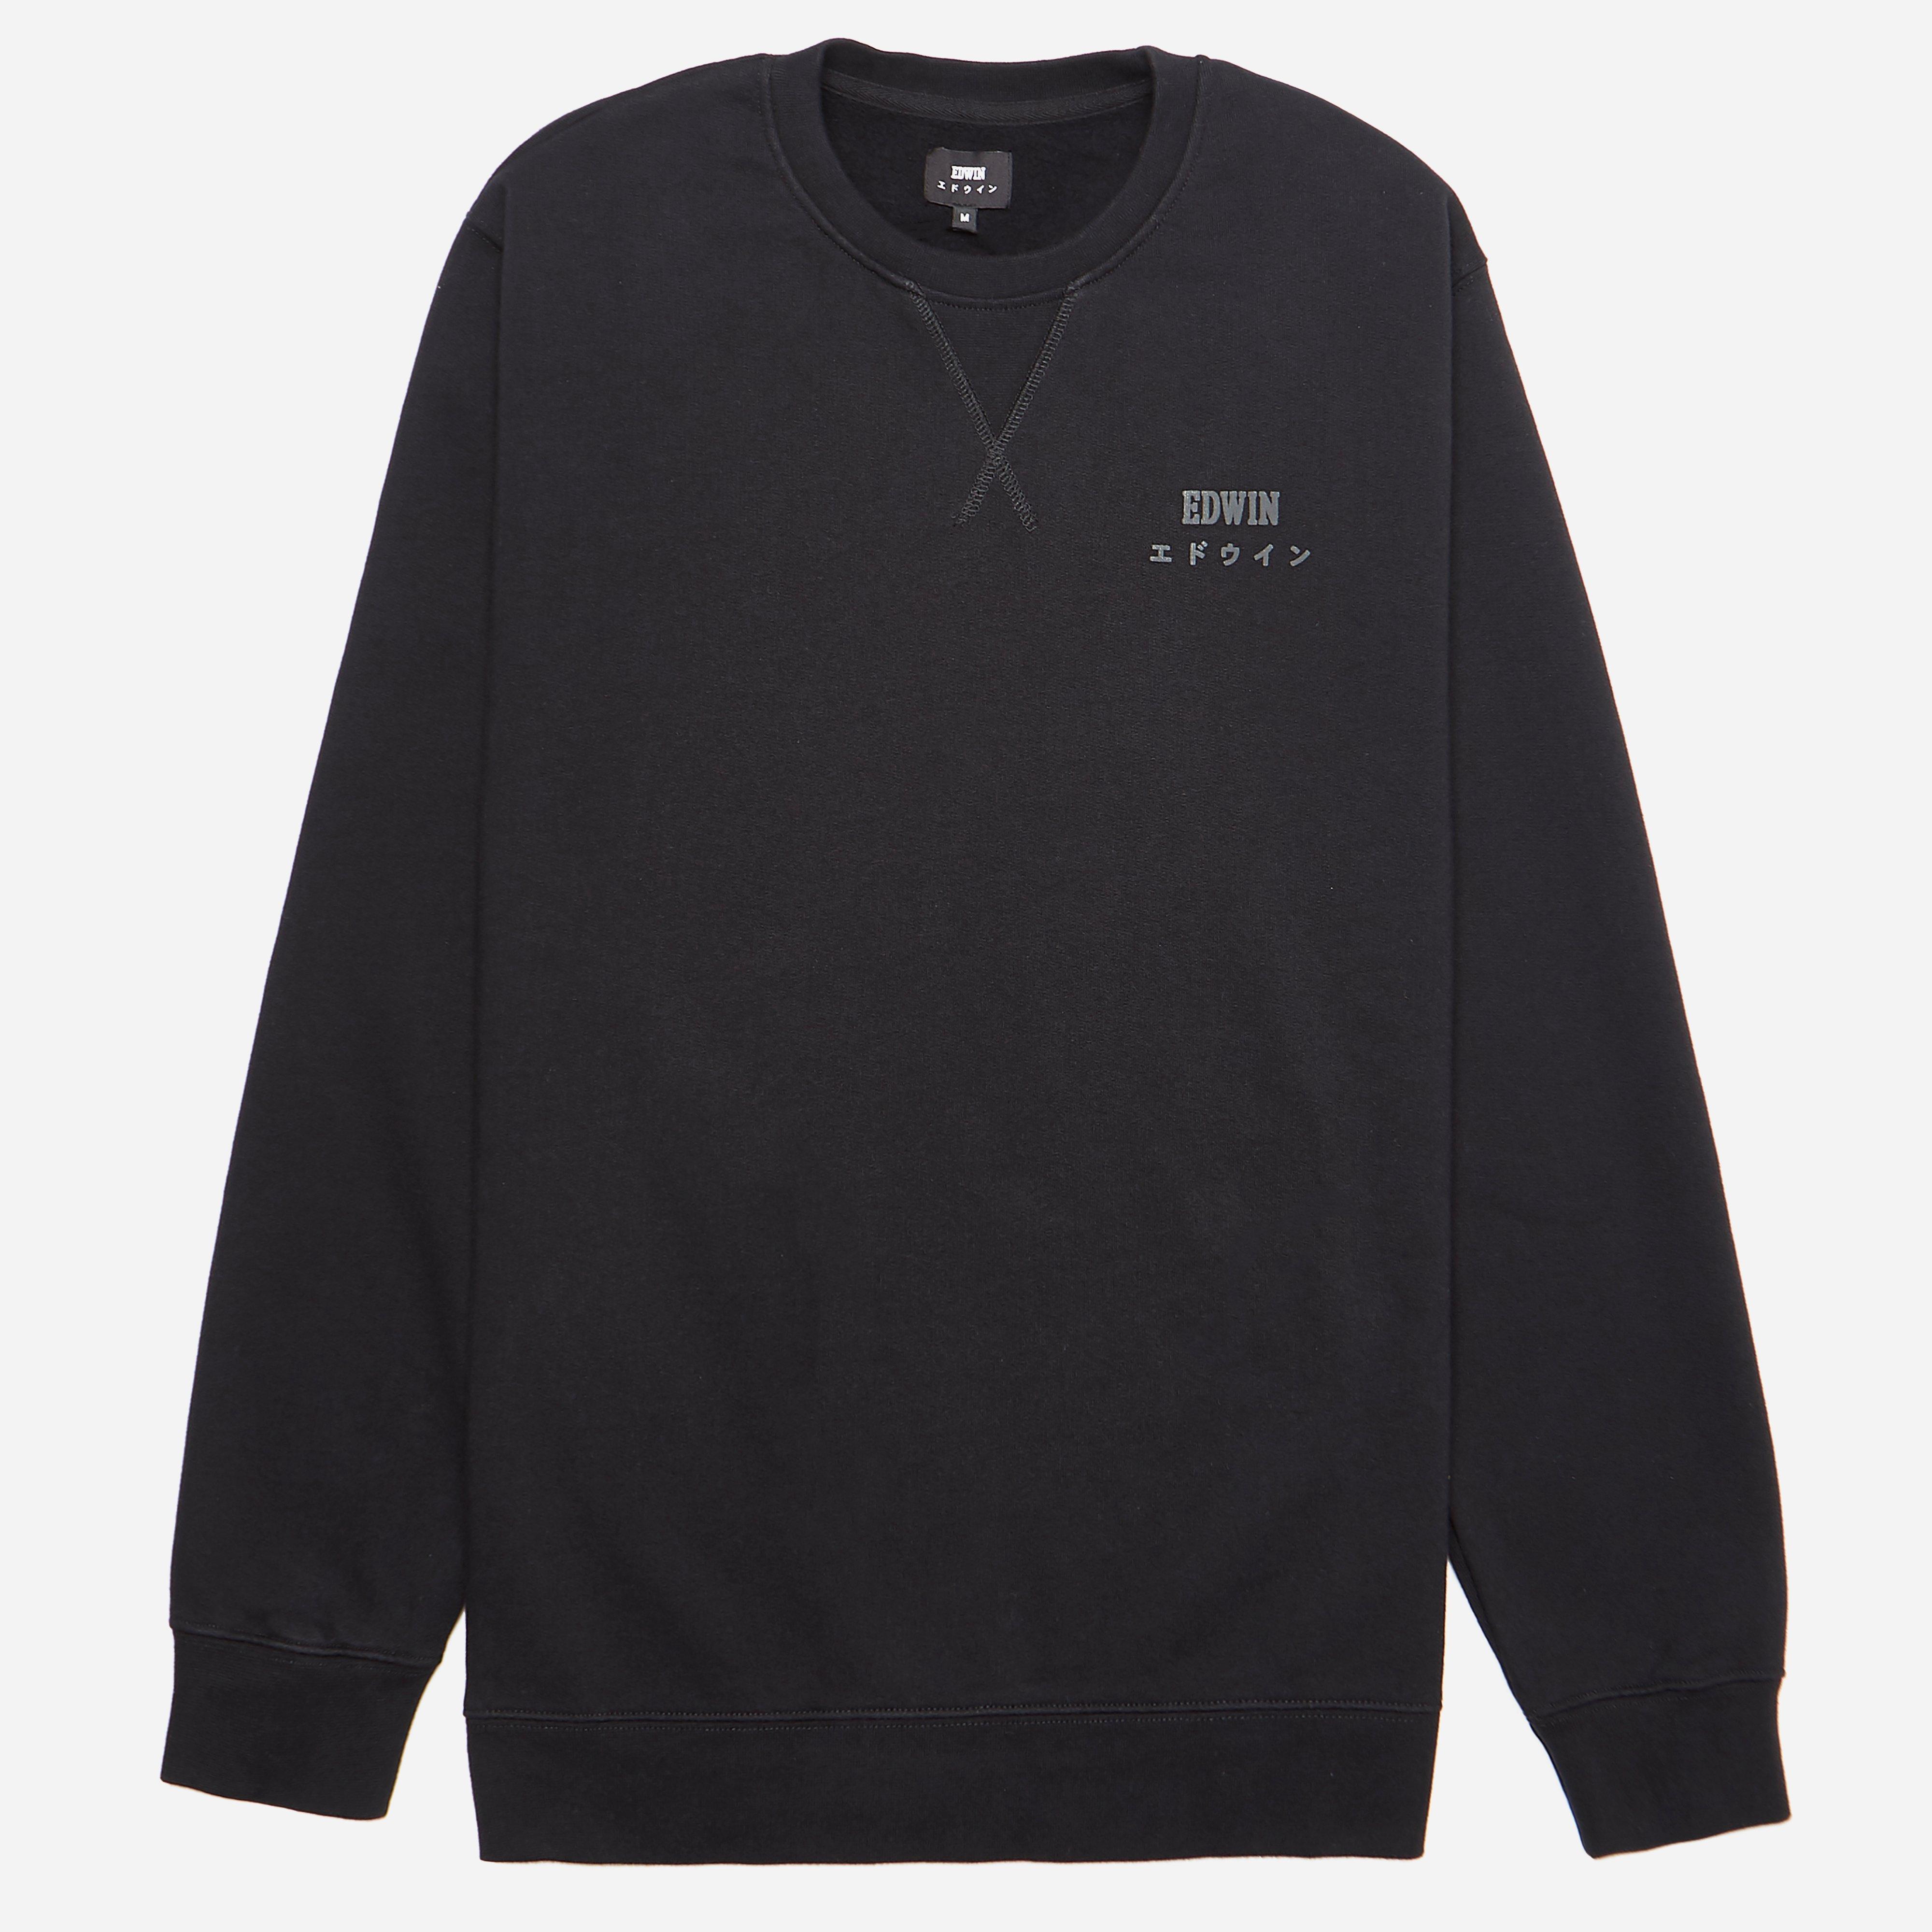 Edwin - Black Heavy Felpa Base Crew Sweatshirt for Men - Lyst. View  fullscreen 5c8c50571b8